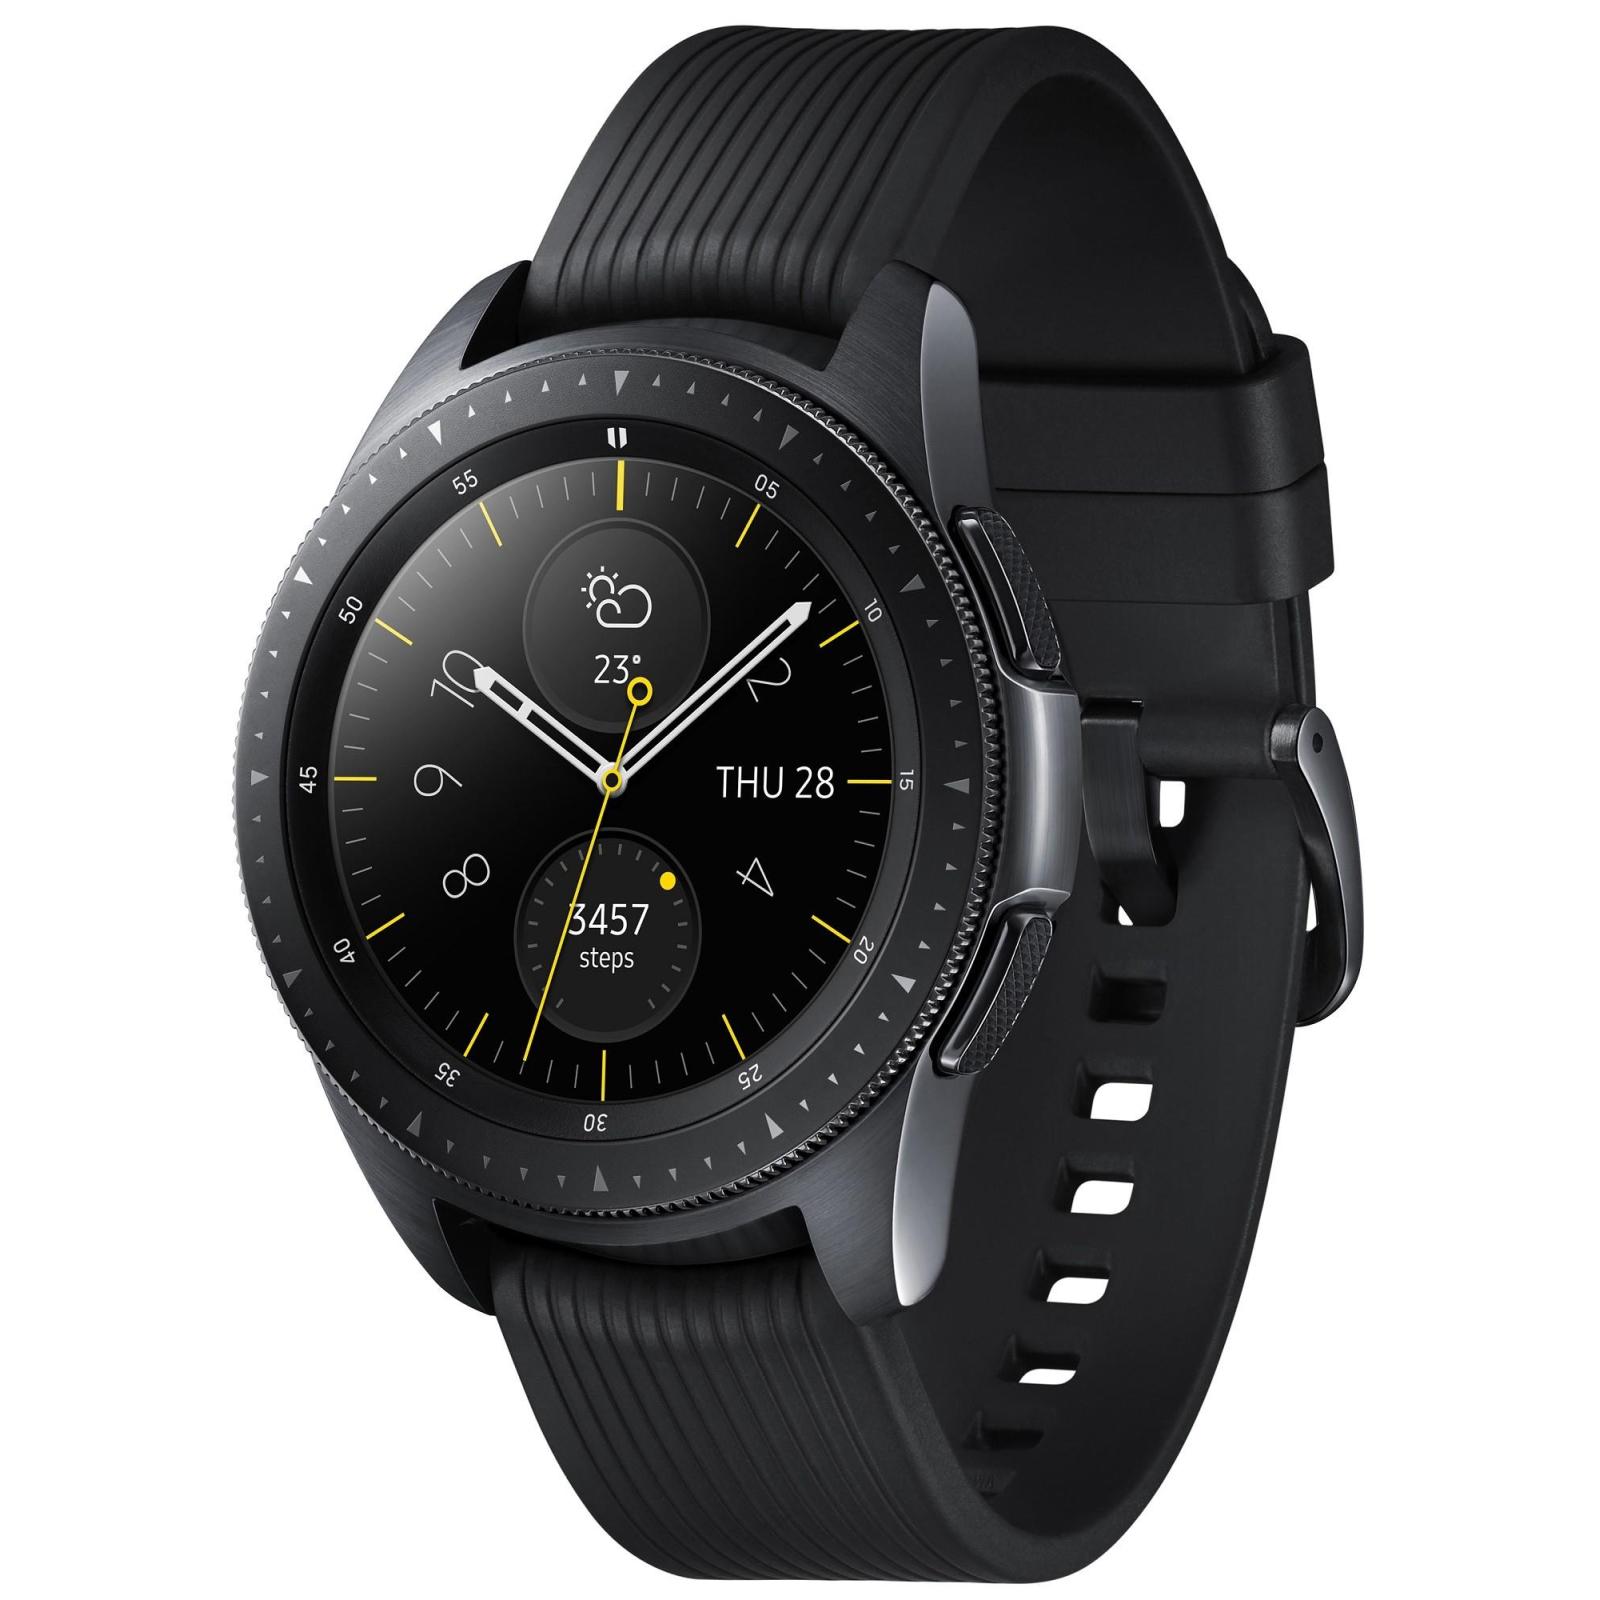 Смарт-часы Samsung SM-R810 Galaxy Watch 42mm Black (SM-R810NZKASEK) изображение 3